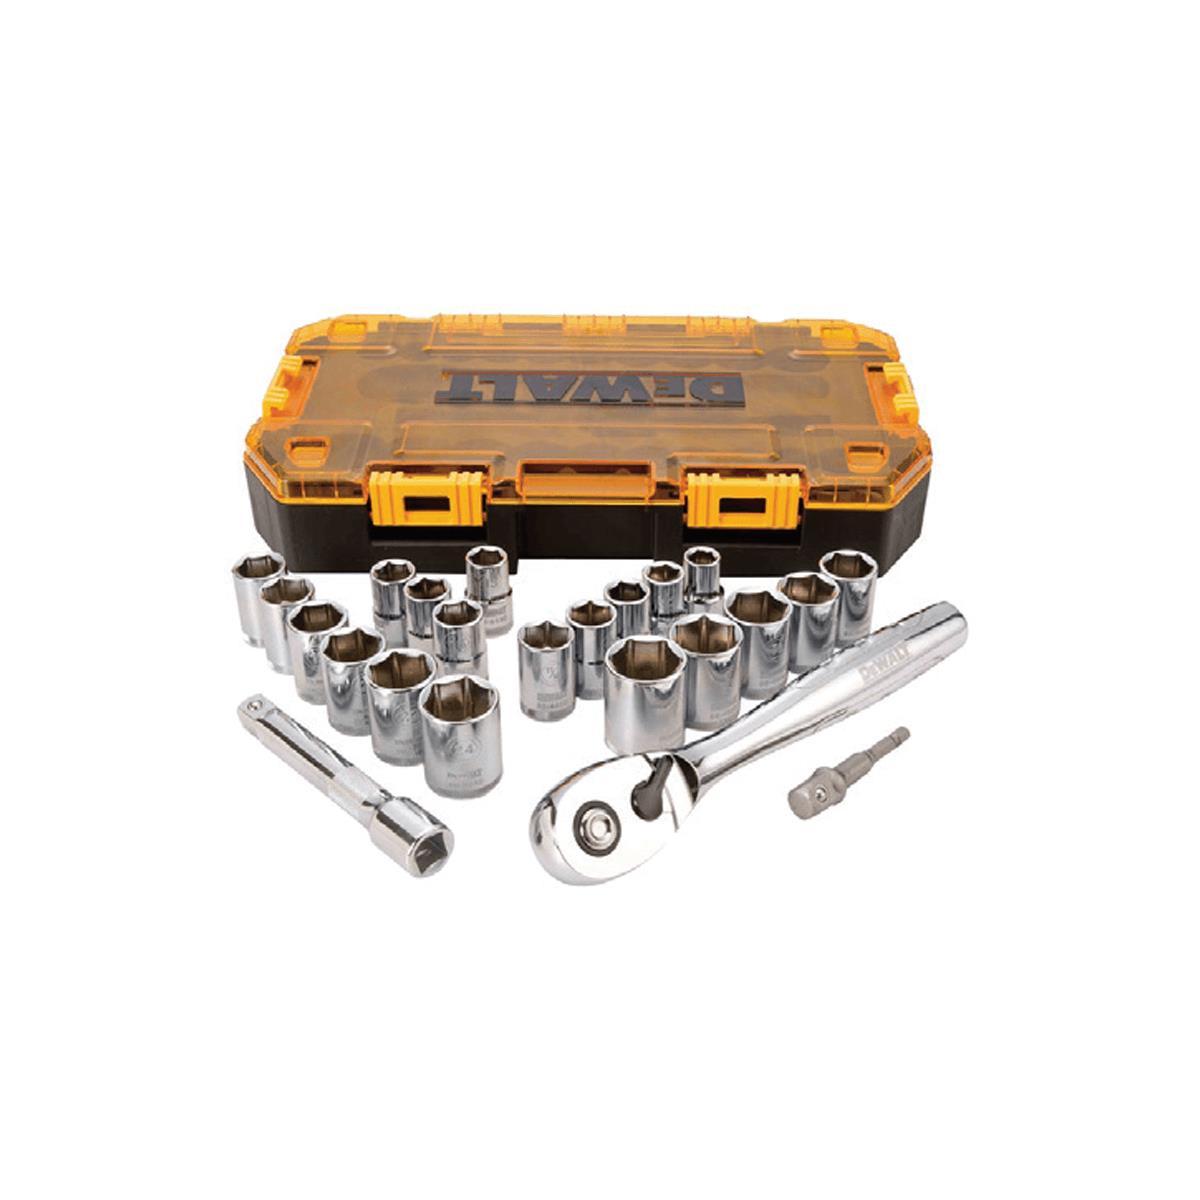 "23 Piece 1/2"" Drive Combination Socket Set"